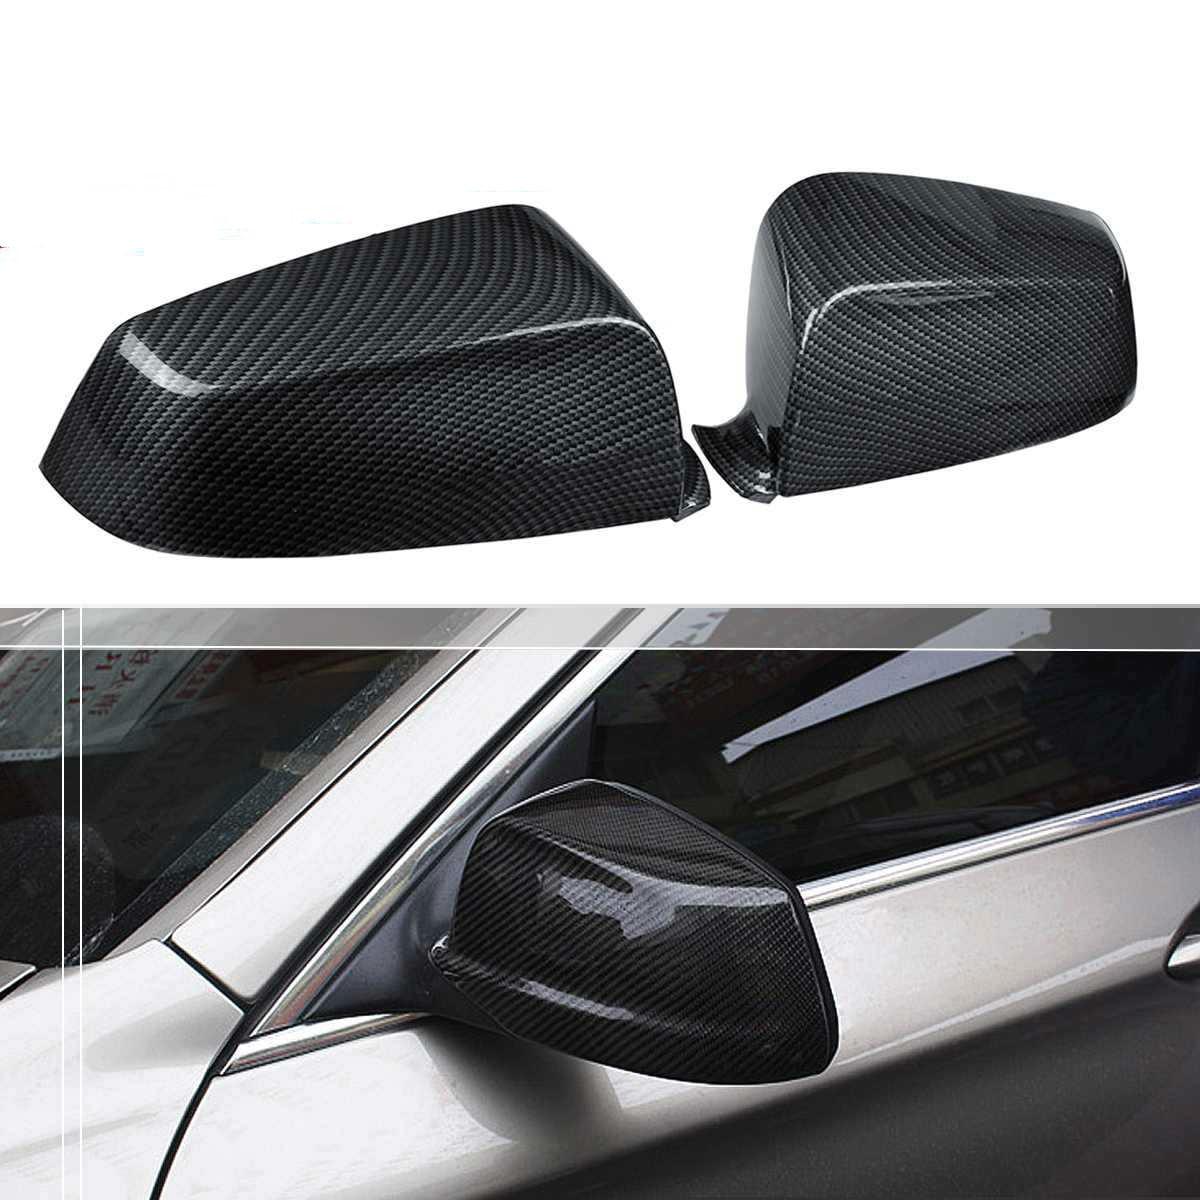 Tapas de espejo lateral de fibra de carbono para coche, 2 uds., tapas de espejo retrovisor lateral, juego compatible con BMW E60 F10 5 Series 2008-2013